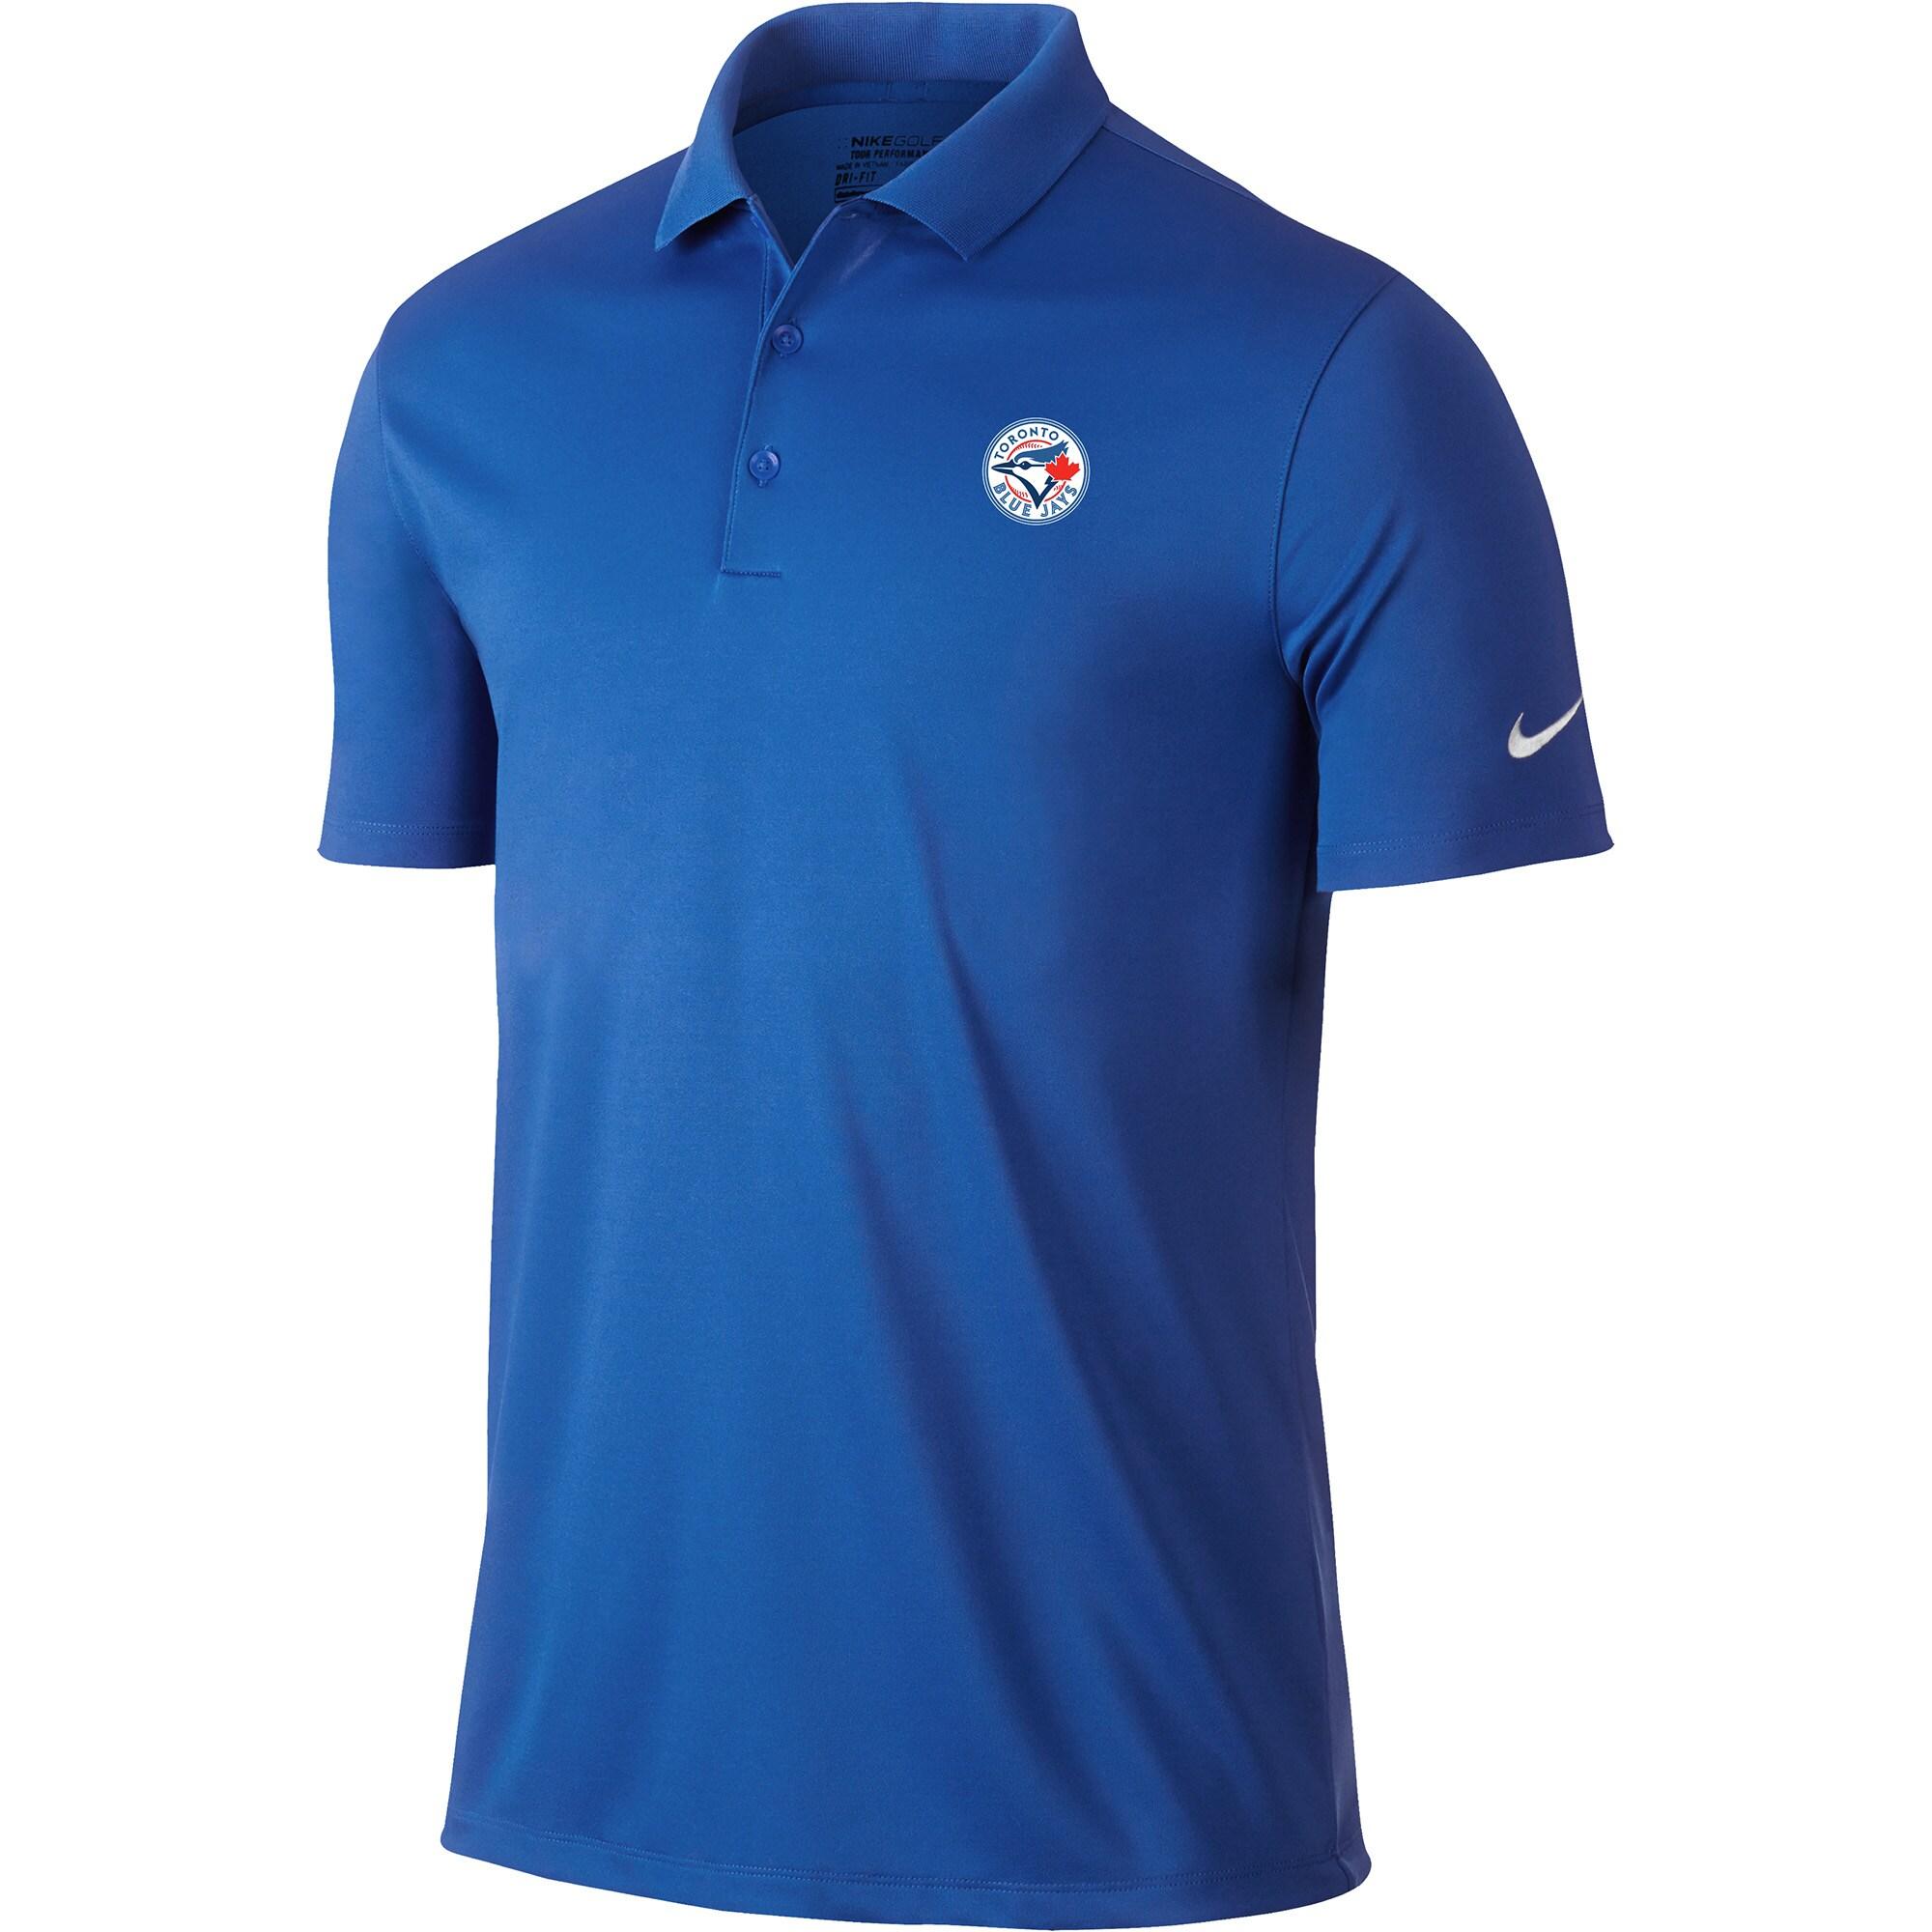 Toronto Blue Jays Nike Golf Victory Solid Performance Polo - Royal